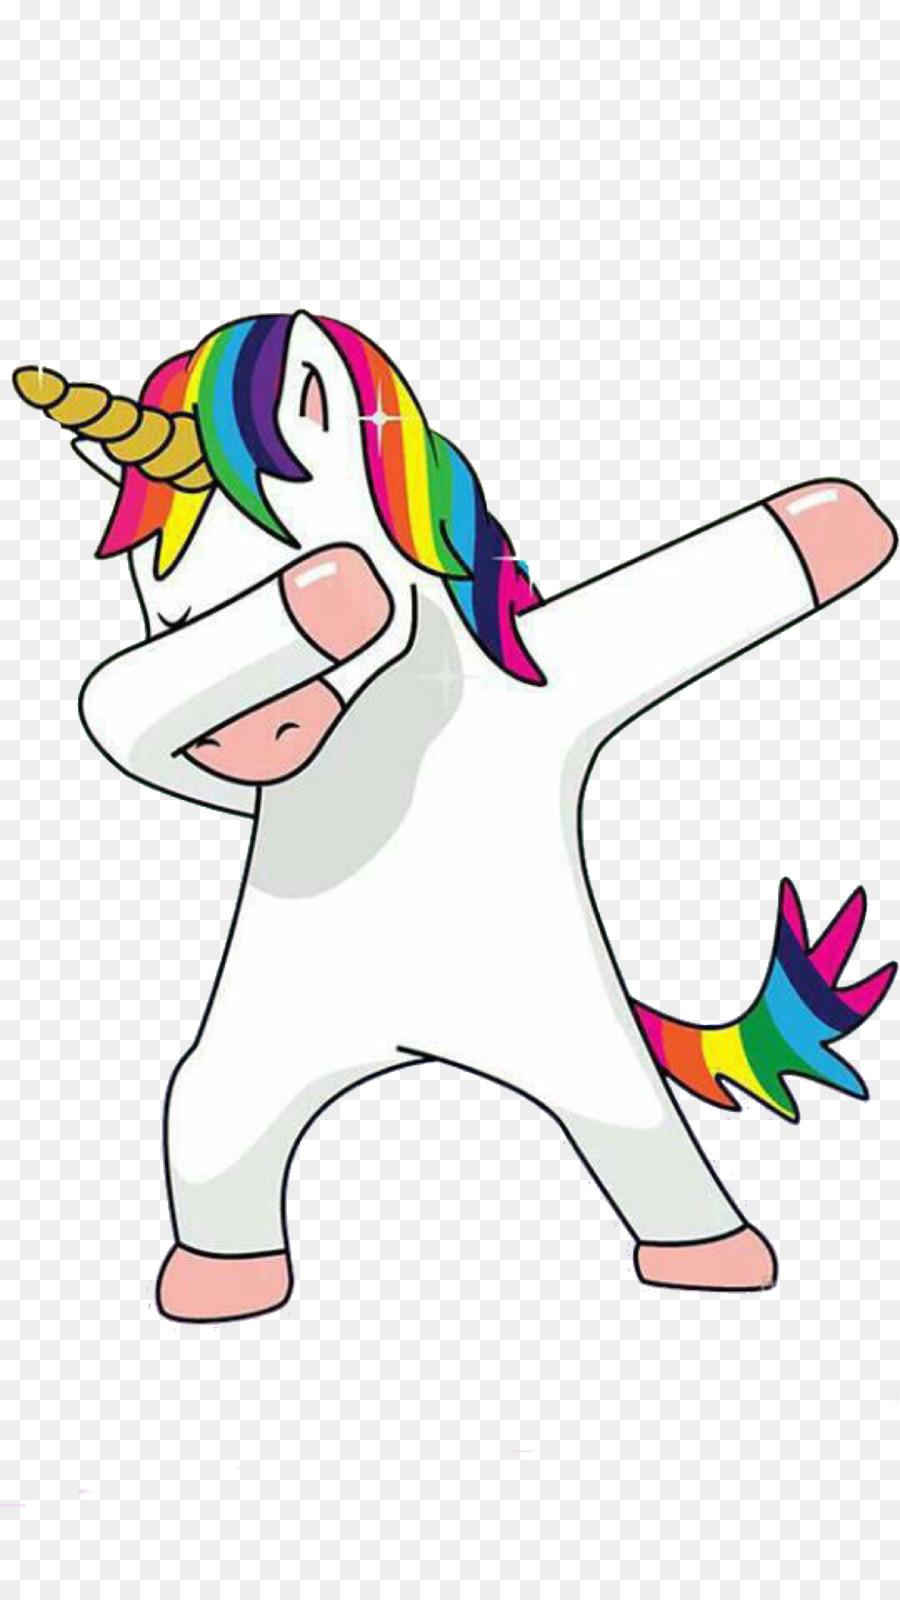 Descarga gratuita de Unicornio, Camiseta, Dab imágenes PNG